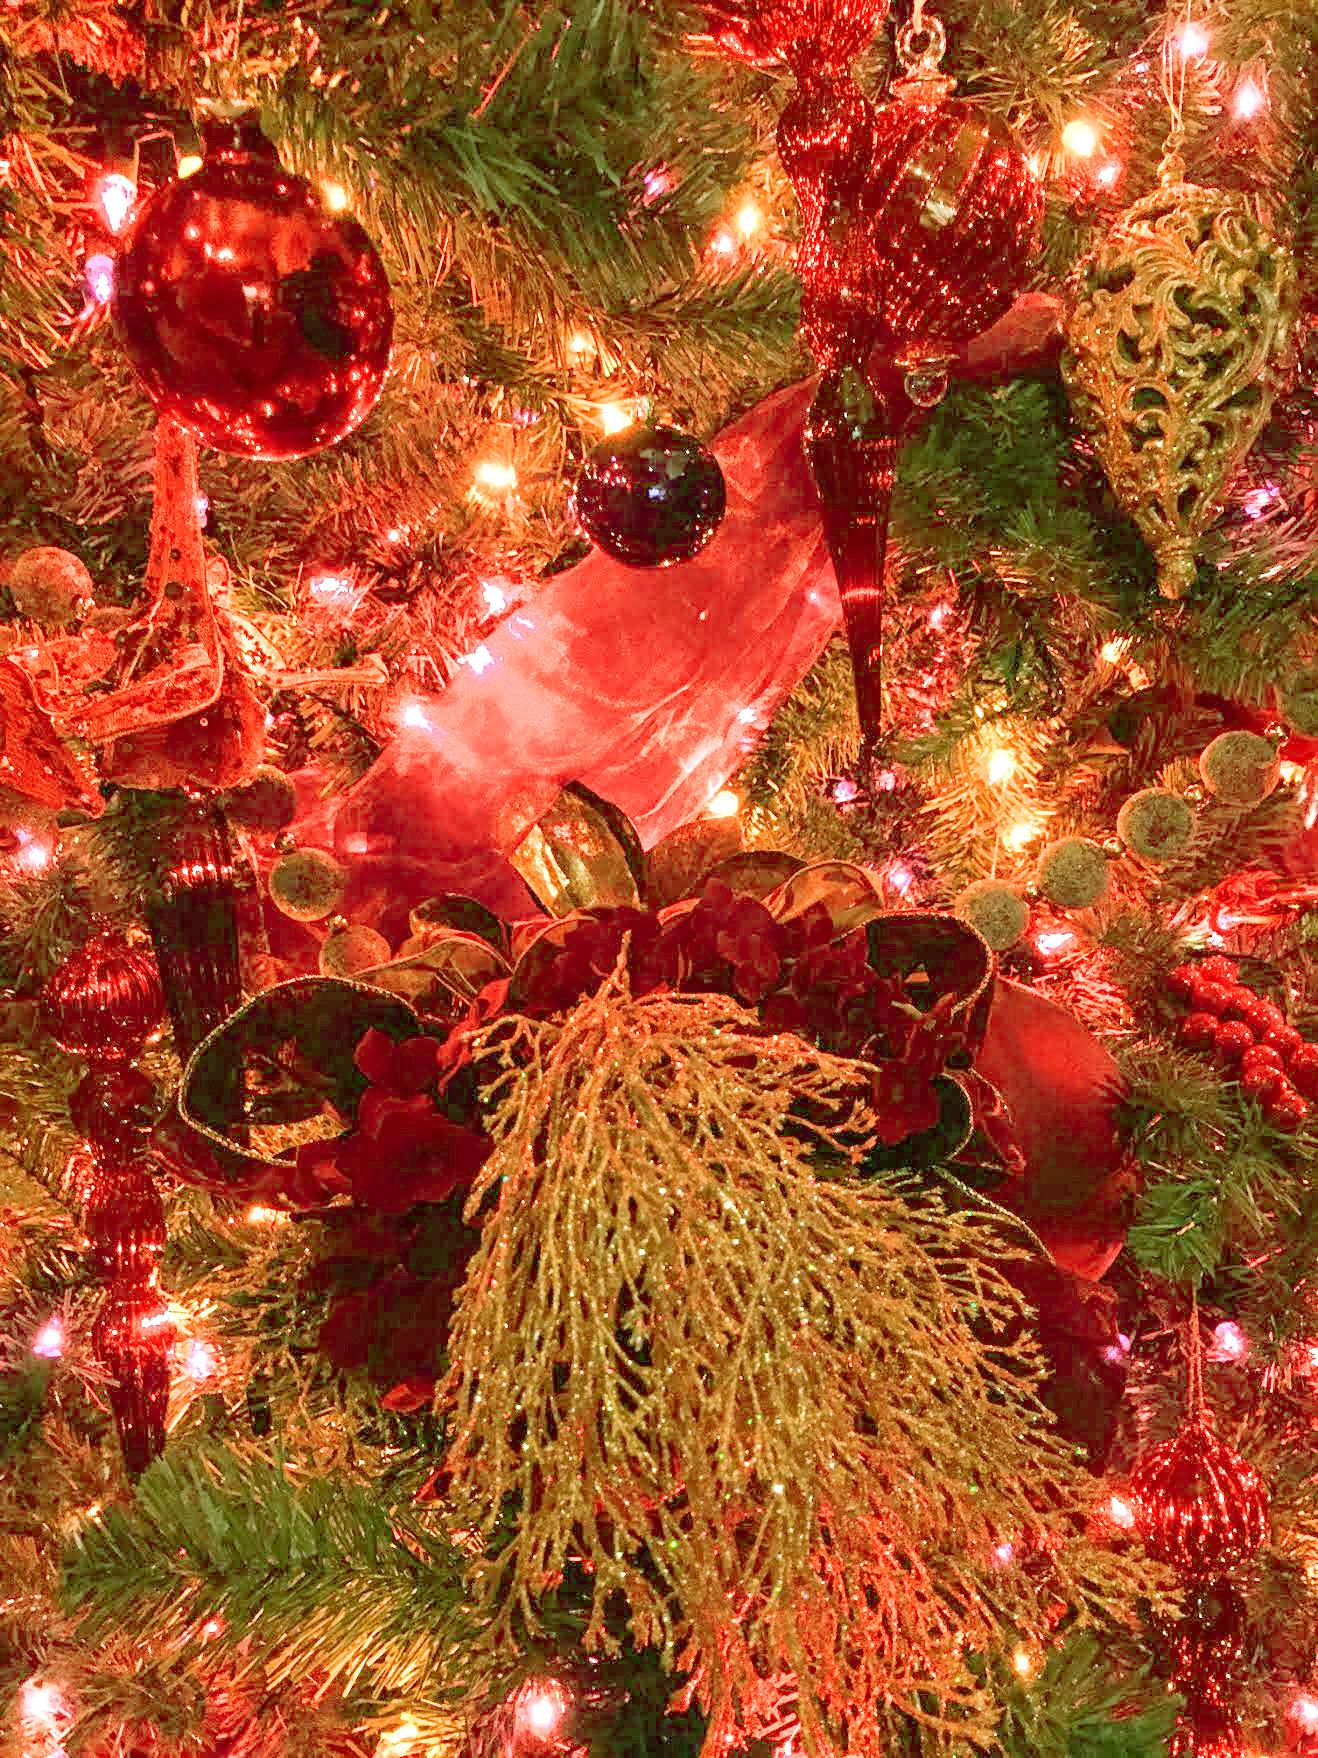 ChristmasTree21-KJ.jpg